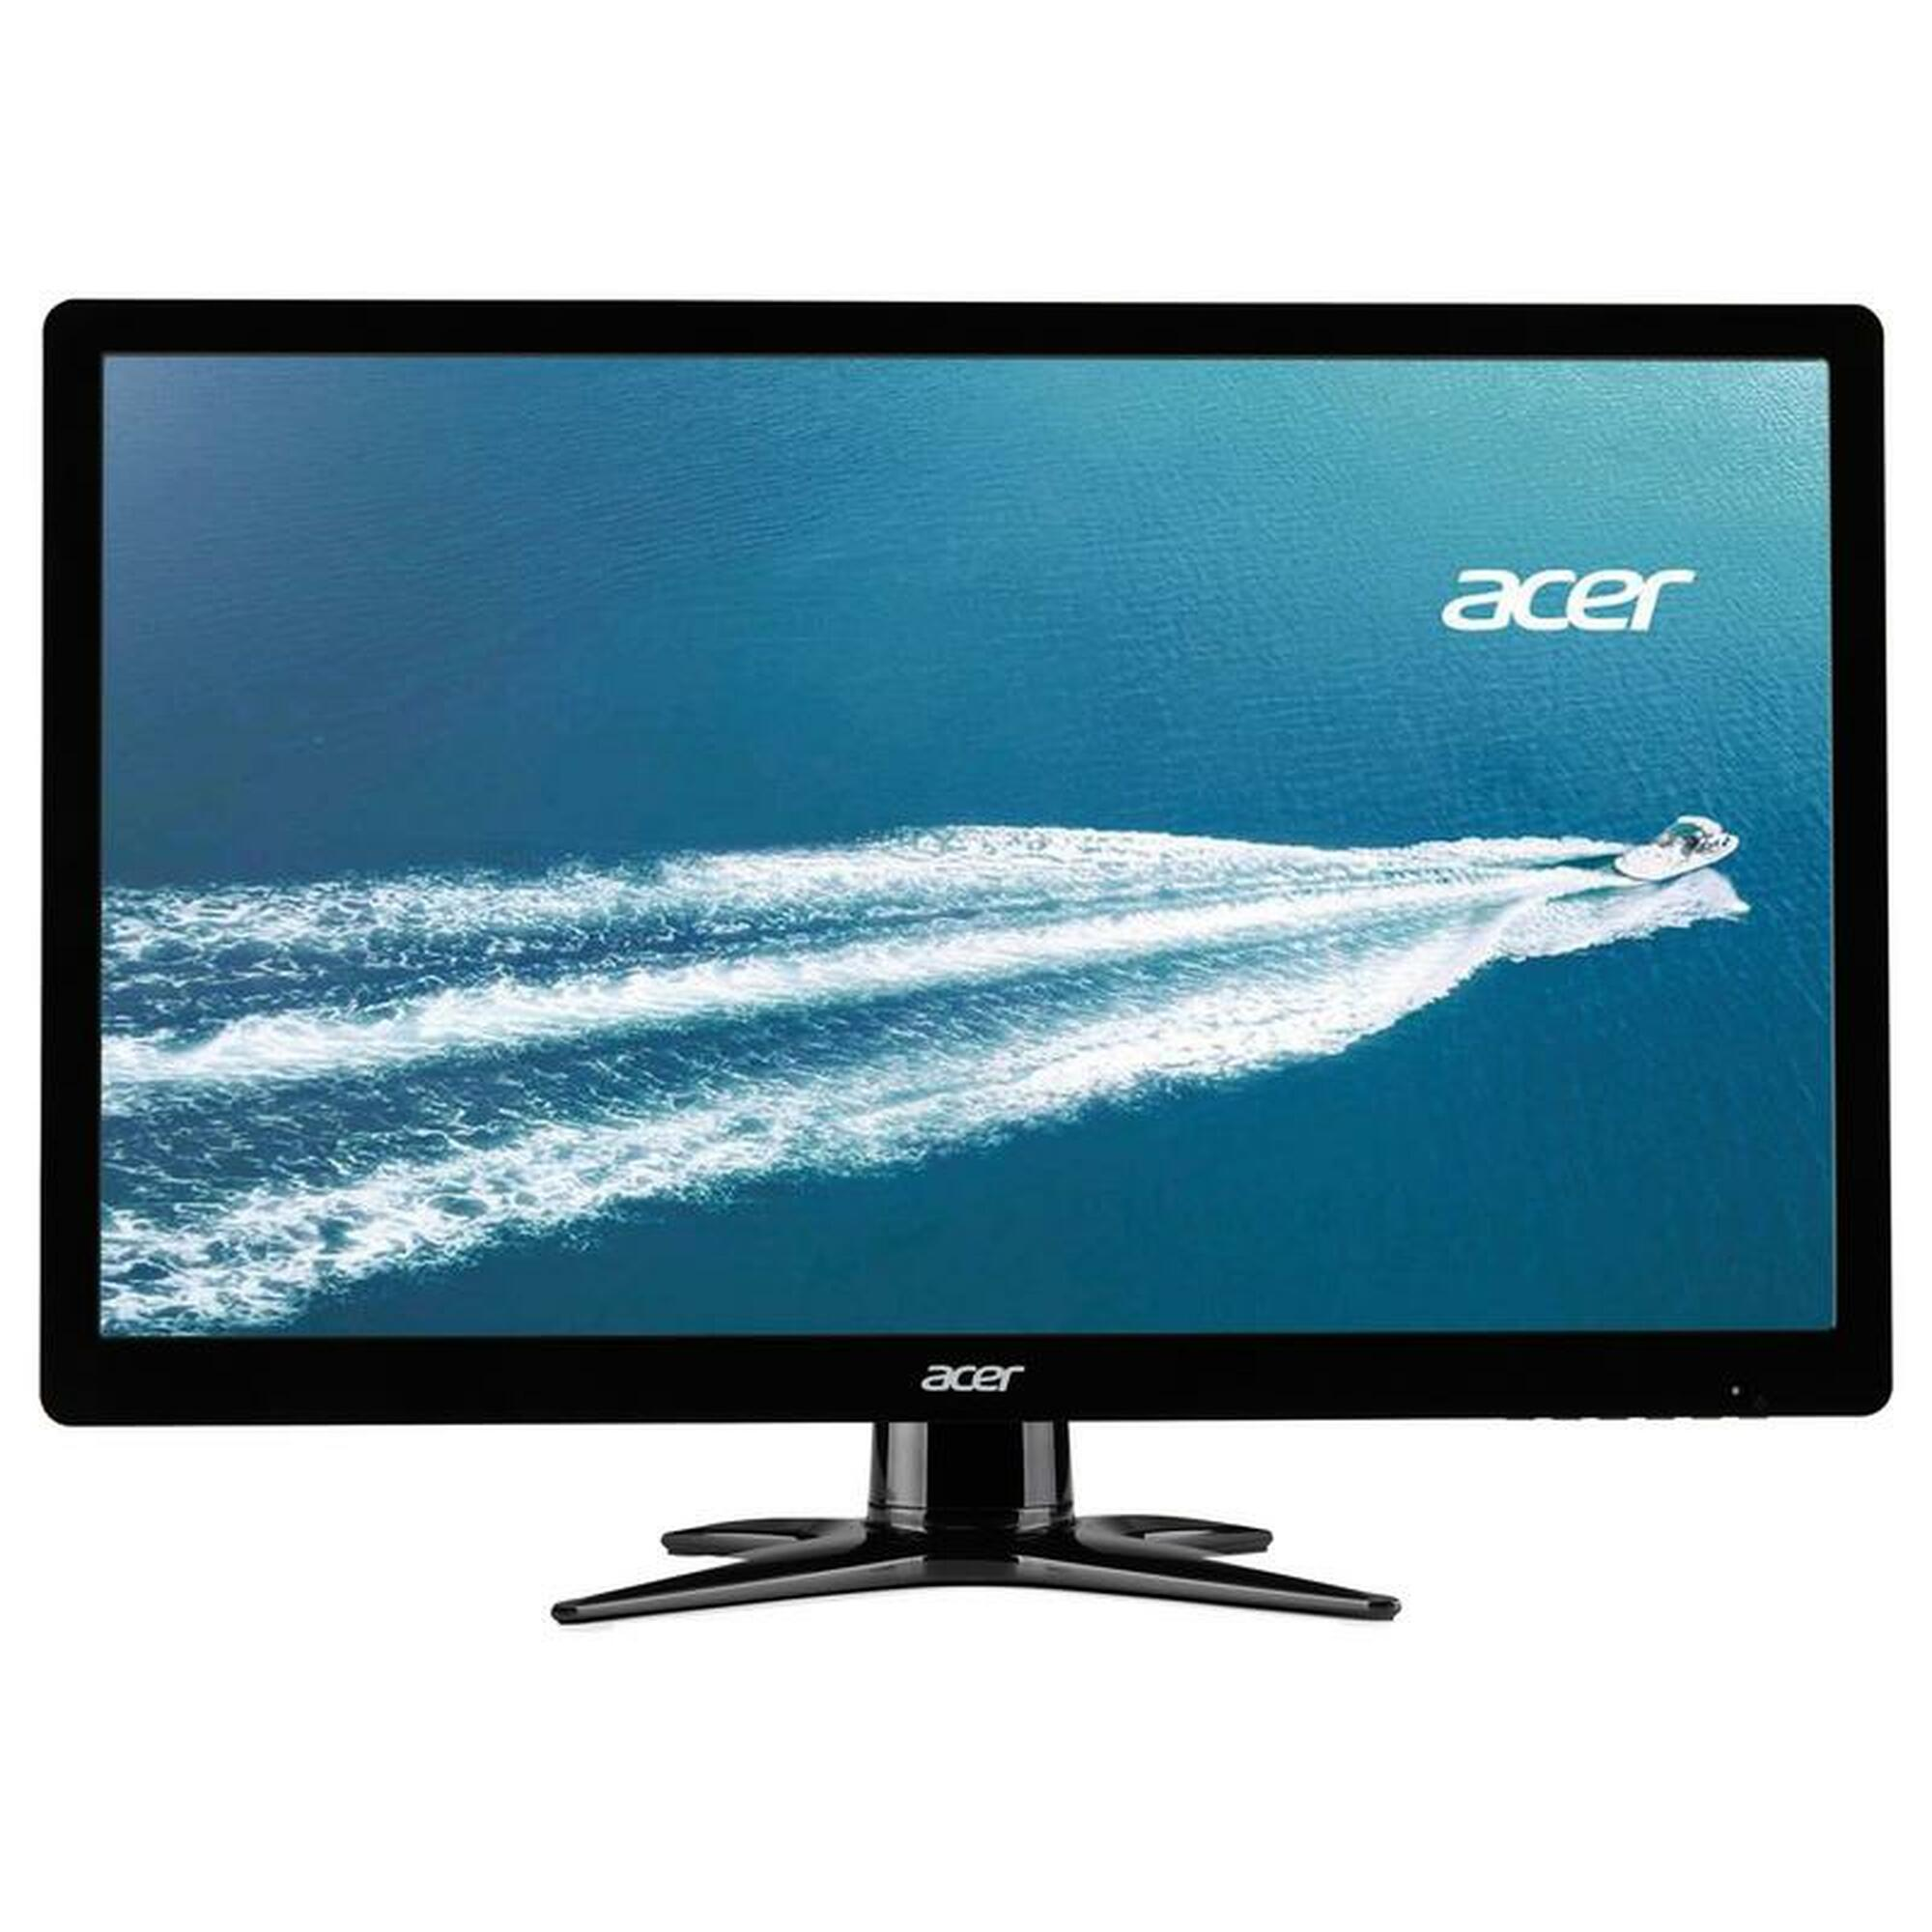 "Acer 8.8"" Widescreen LCD Monitor Display HD+ 8 X 8 8 ms TN Film   G8HQL"